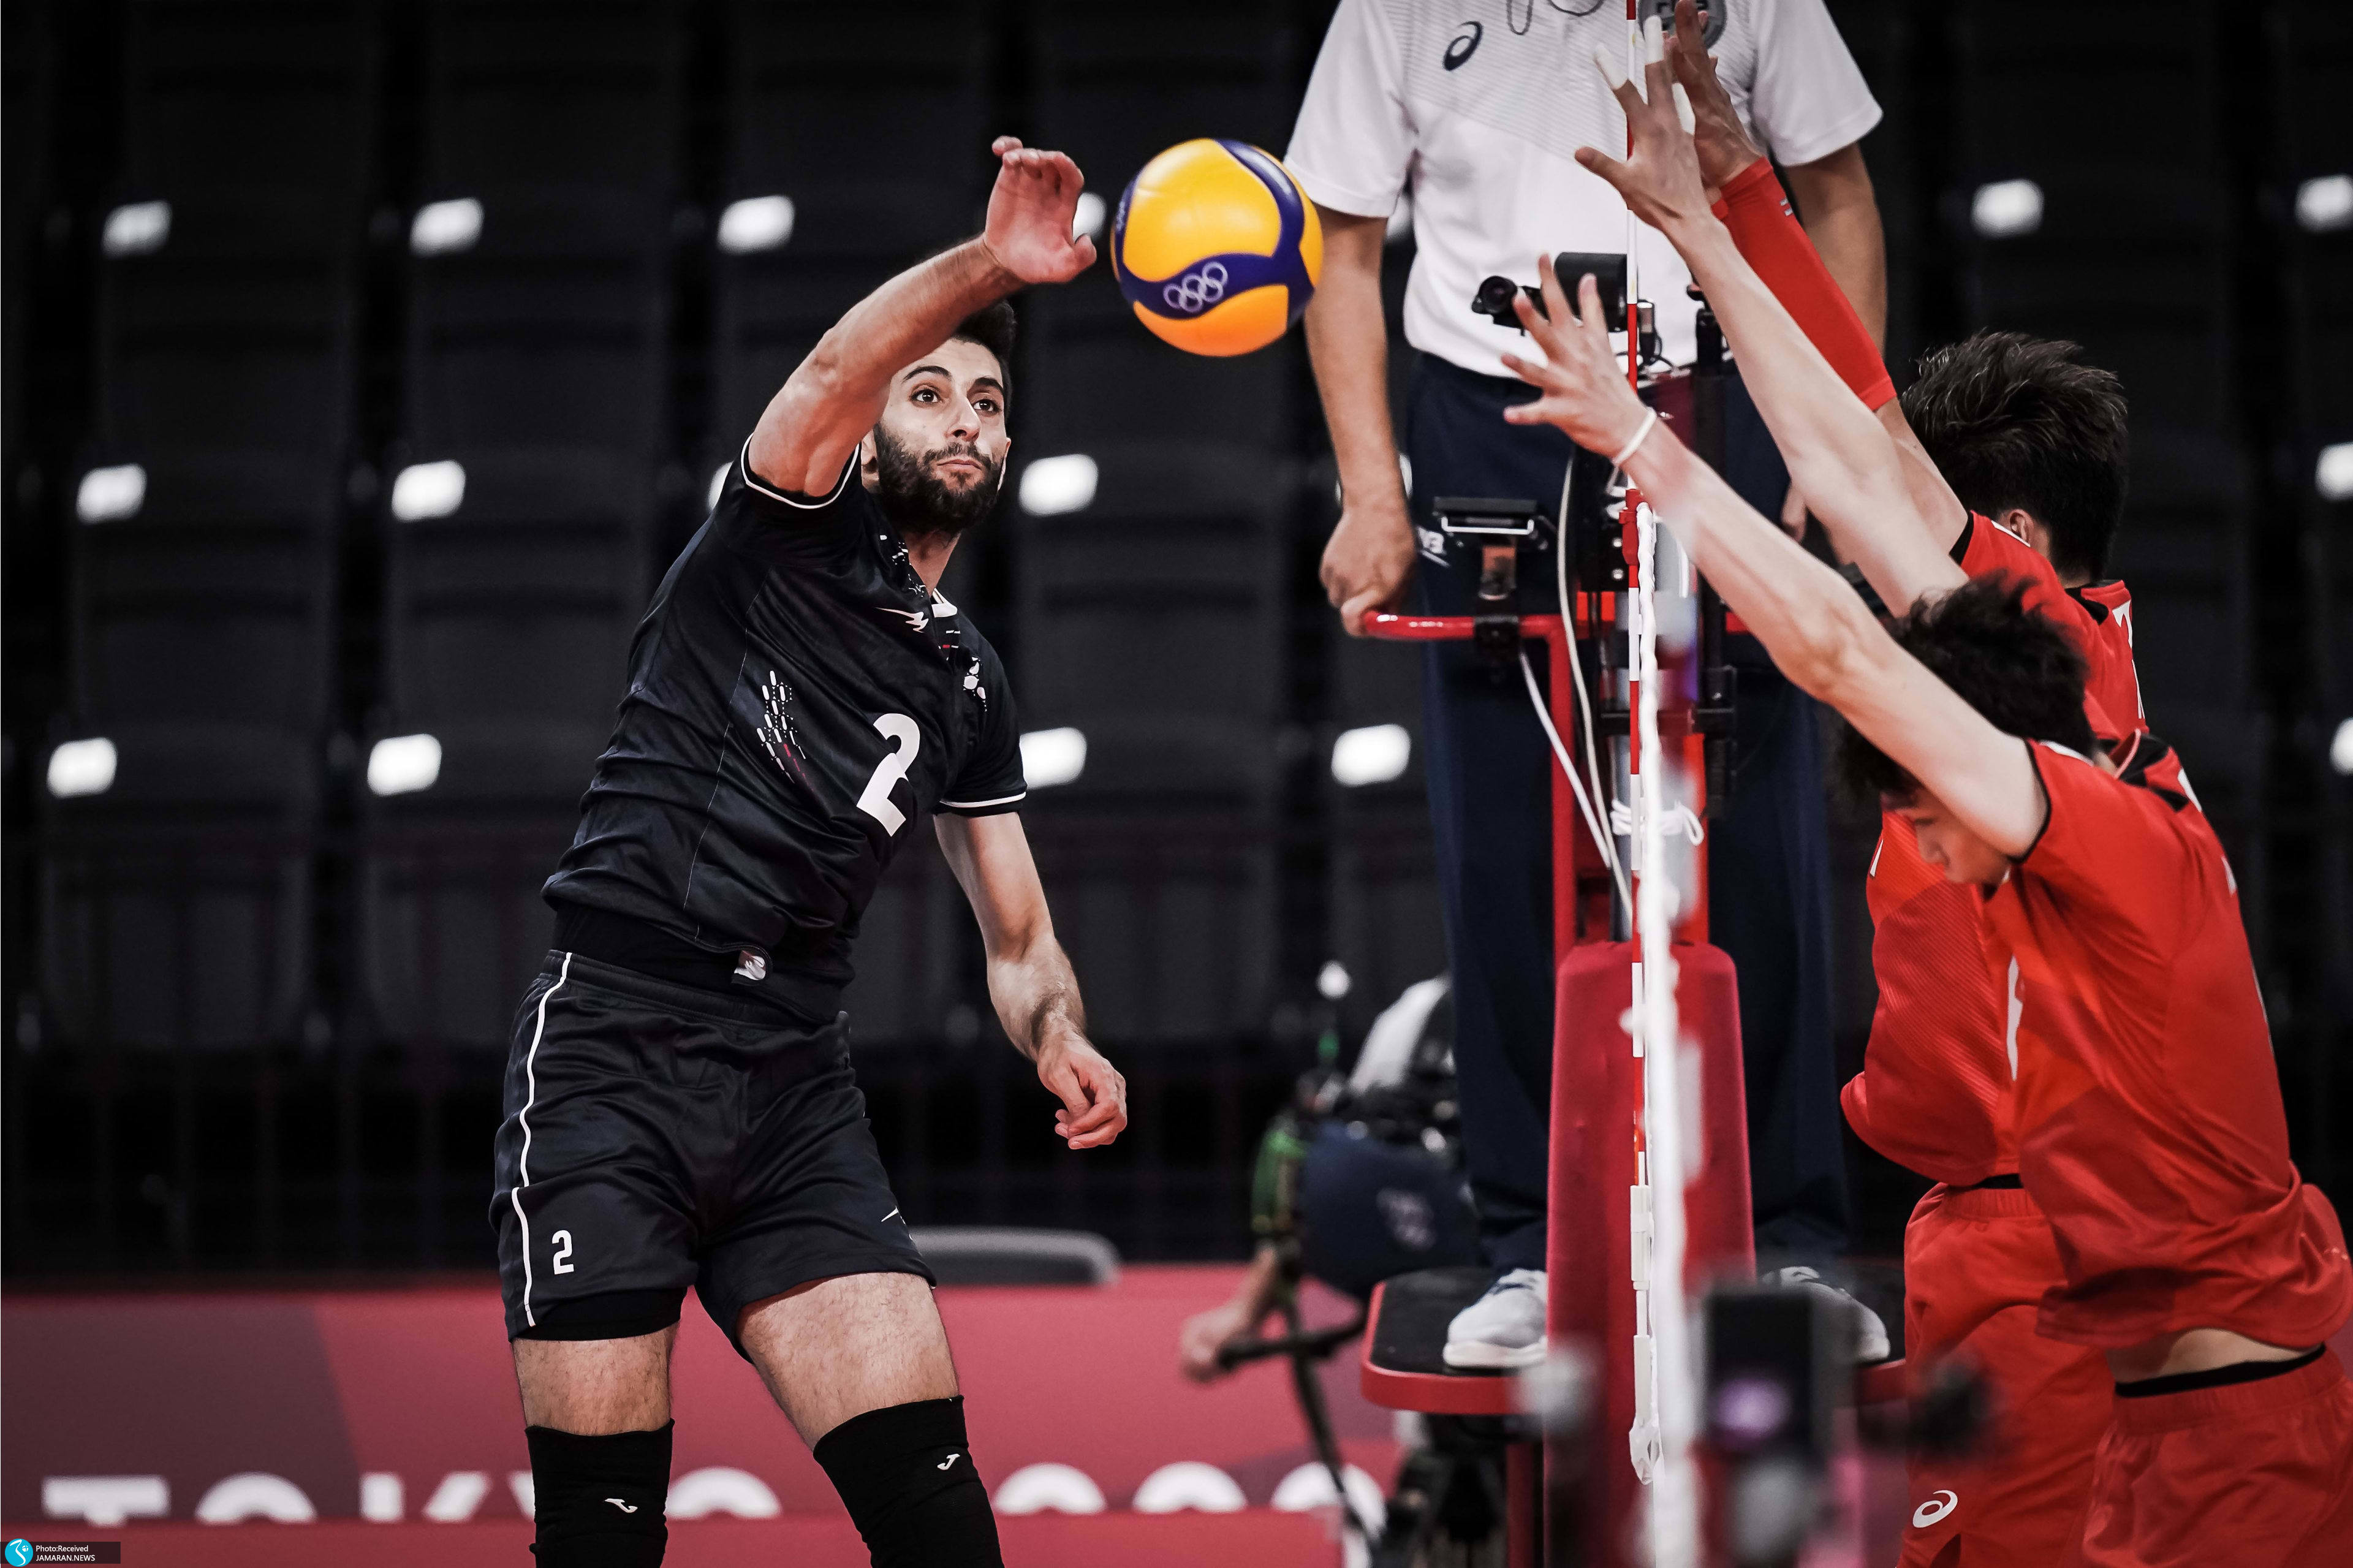 والیبال ایران و ژاپن در المپیک میلاد عبادی پور